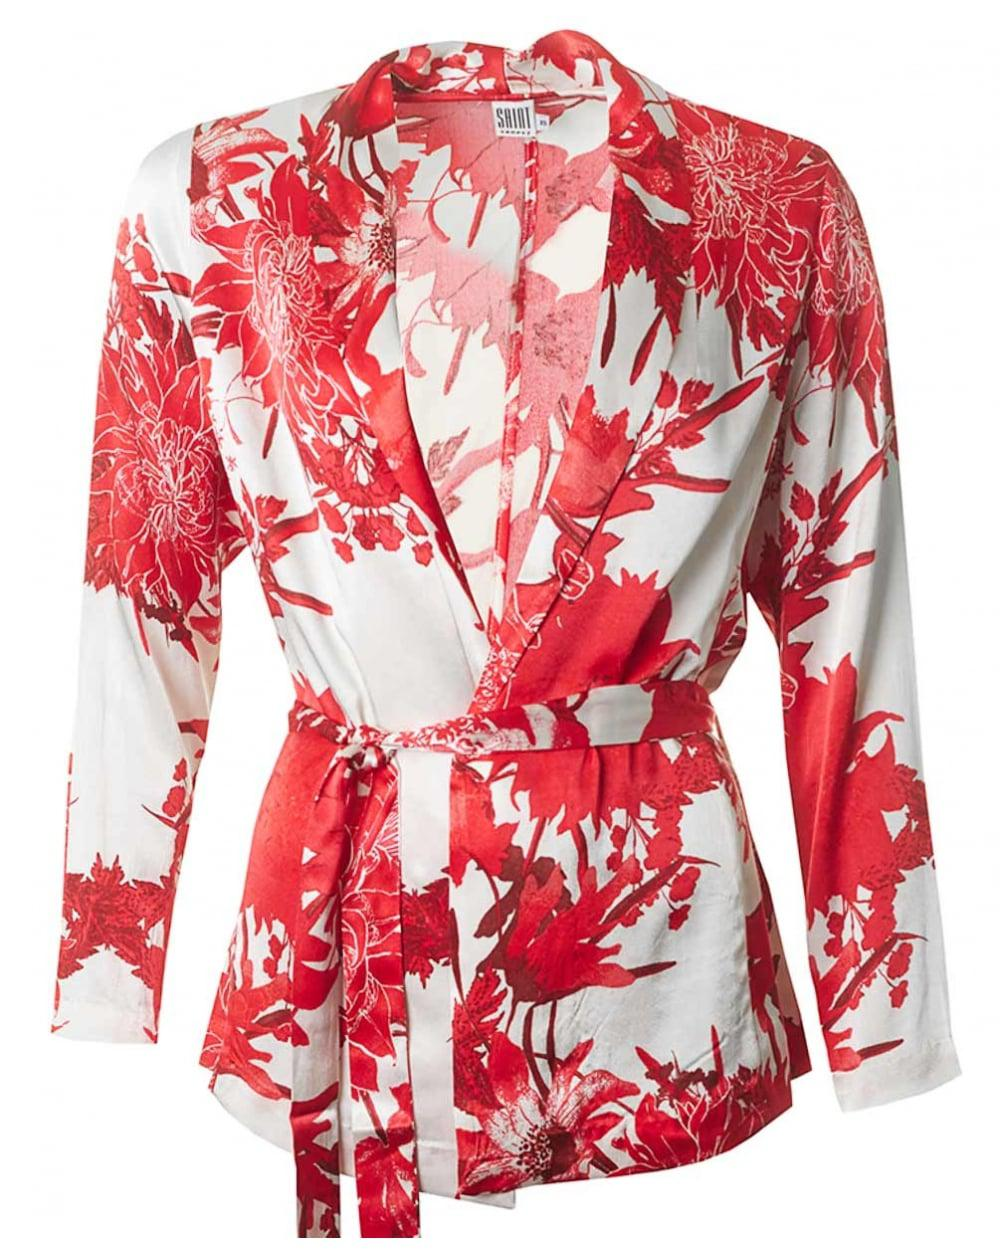 Lyst - Saint Tropez Flower Print Kimono Shirt in Red